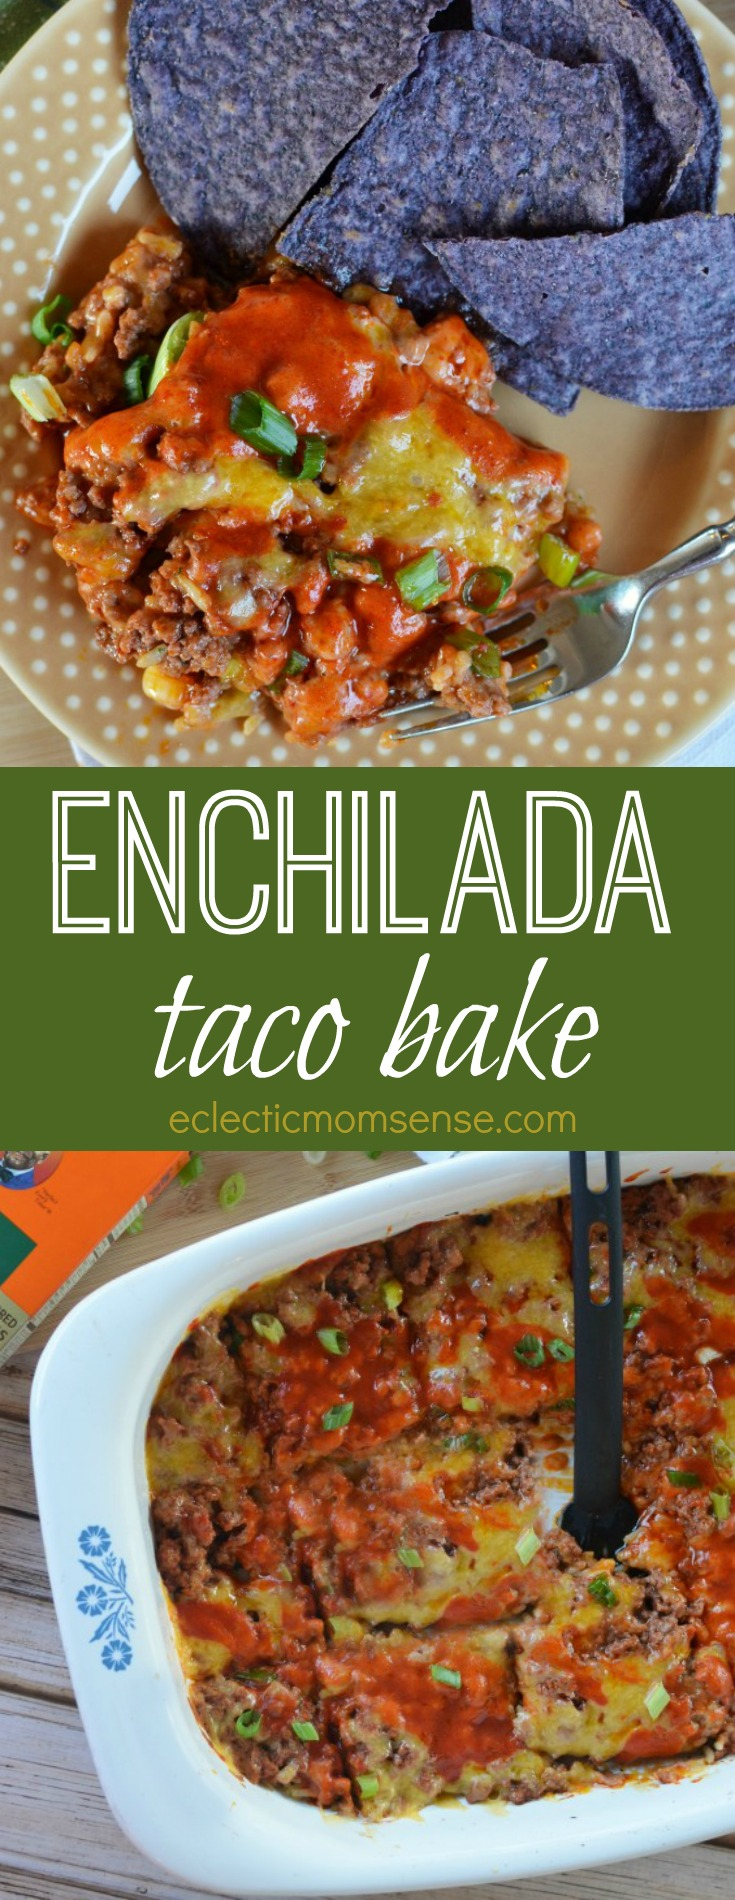 Enchilada Taco Bake